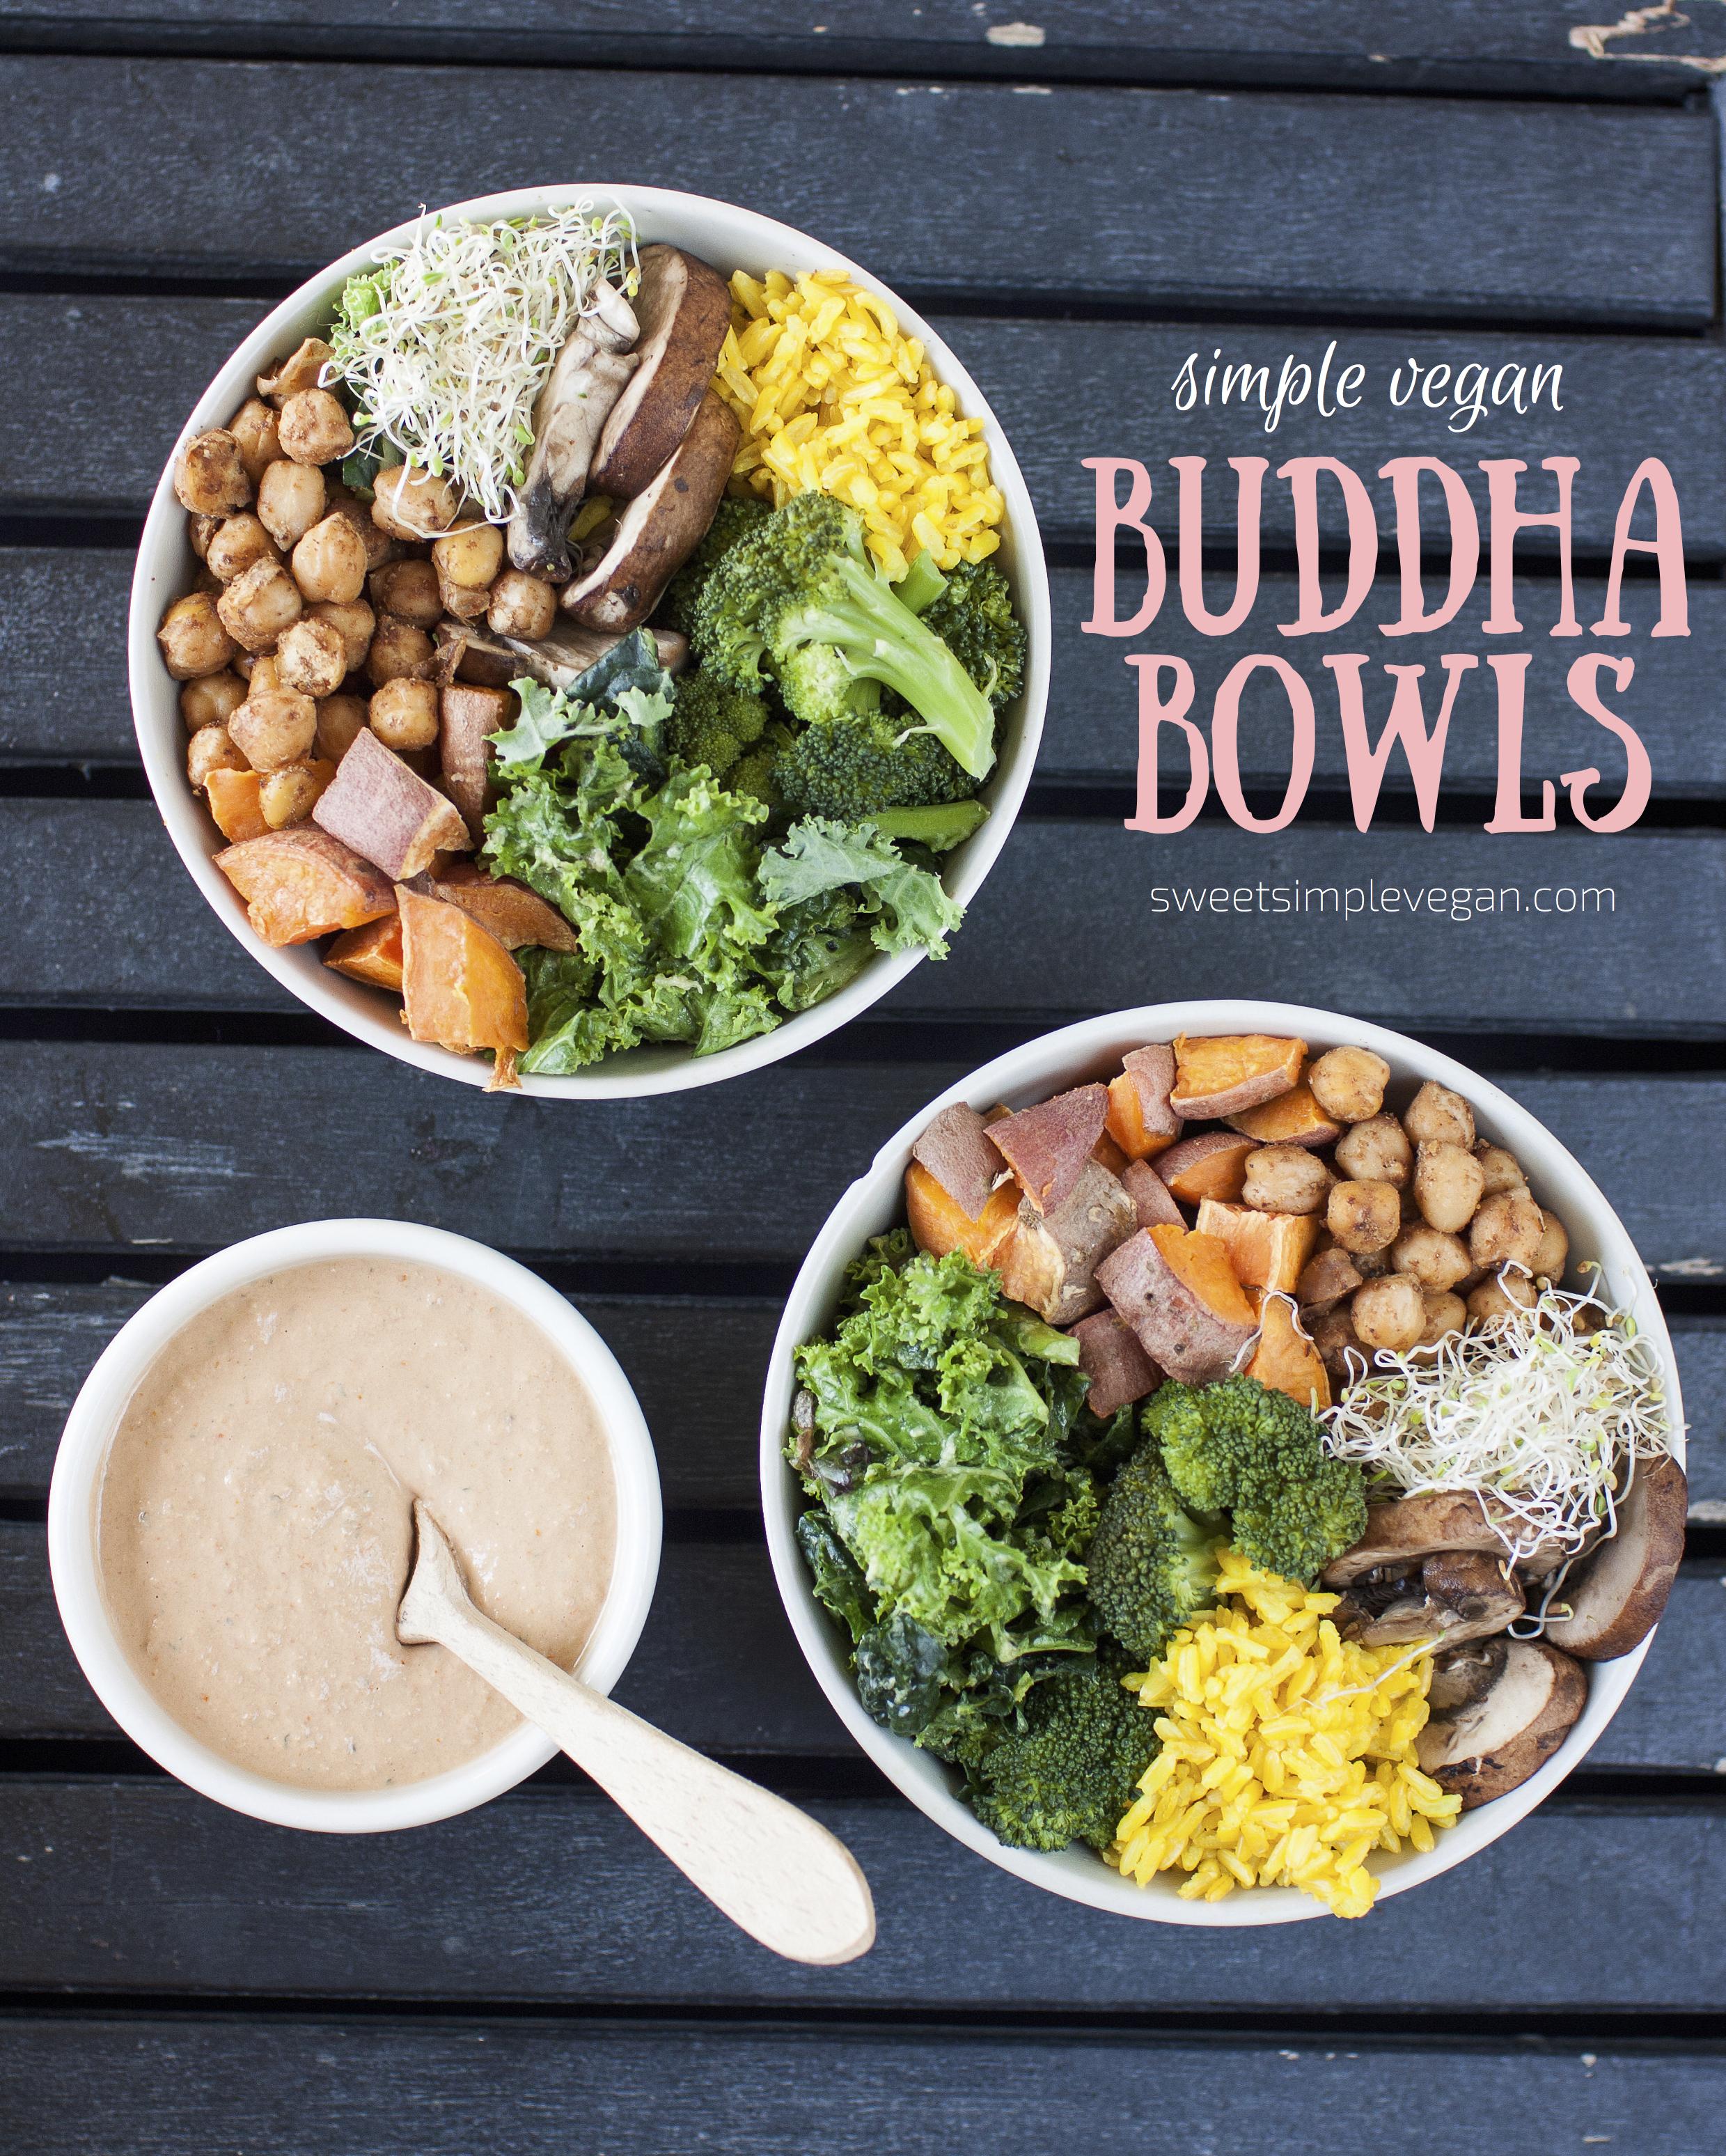 Simple Vegan Buddha Bowls w/ Sundried Tomato Tahini Dressing & Savory Granola {oil-free} sweetsimplevegan.com